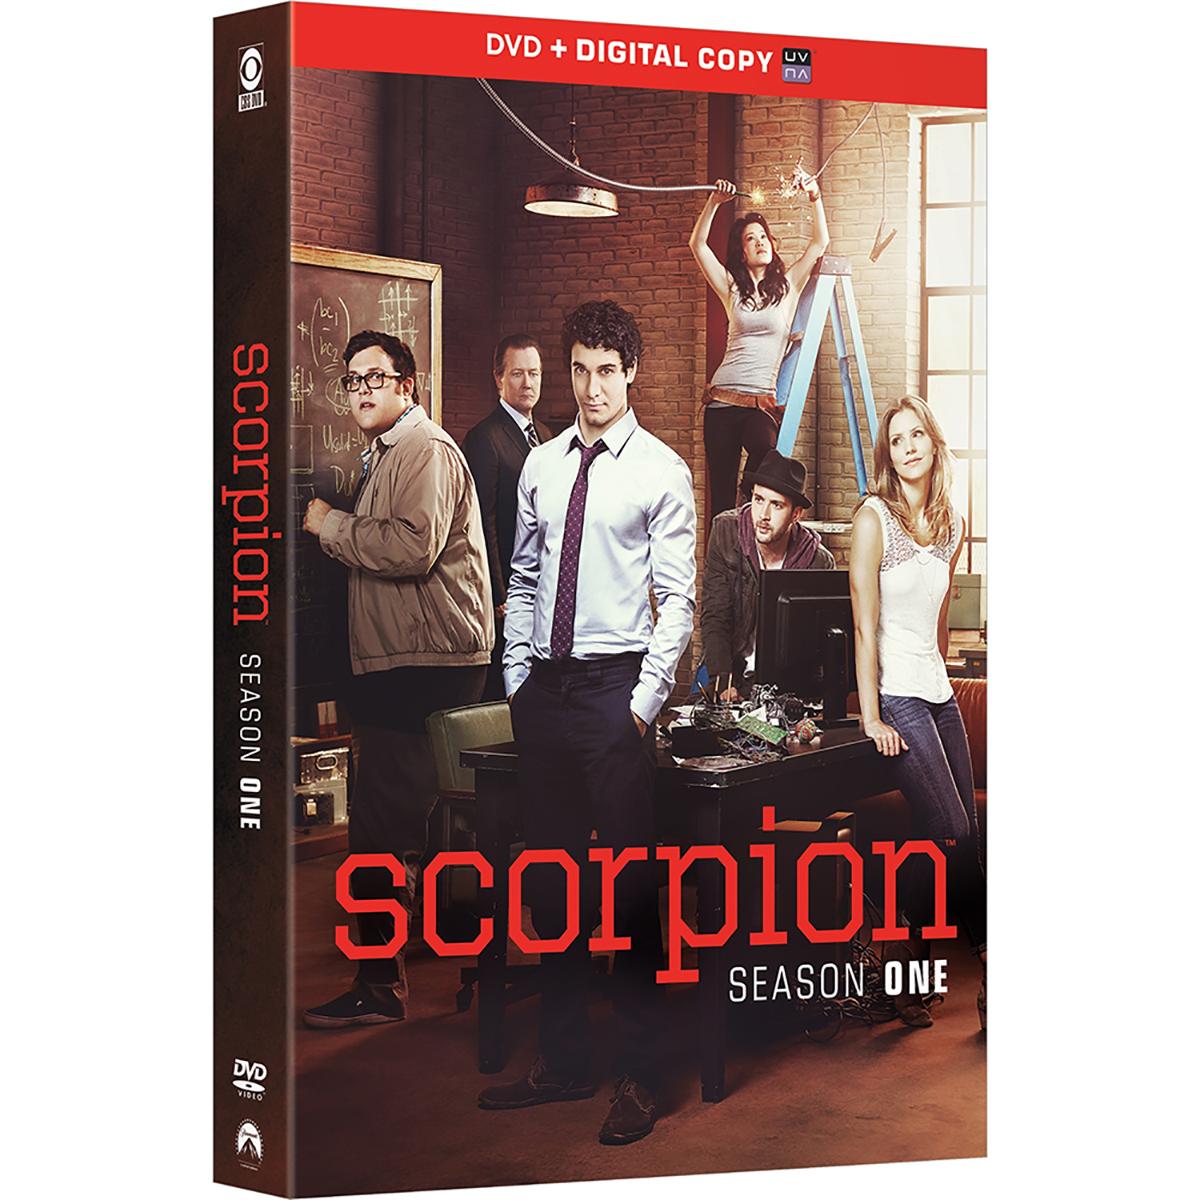 Scorpion: Season 1 (DVD + UltraViolet)